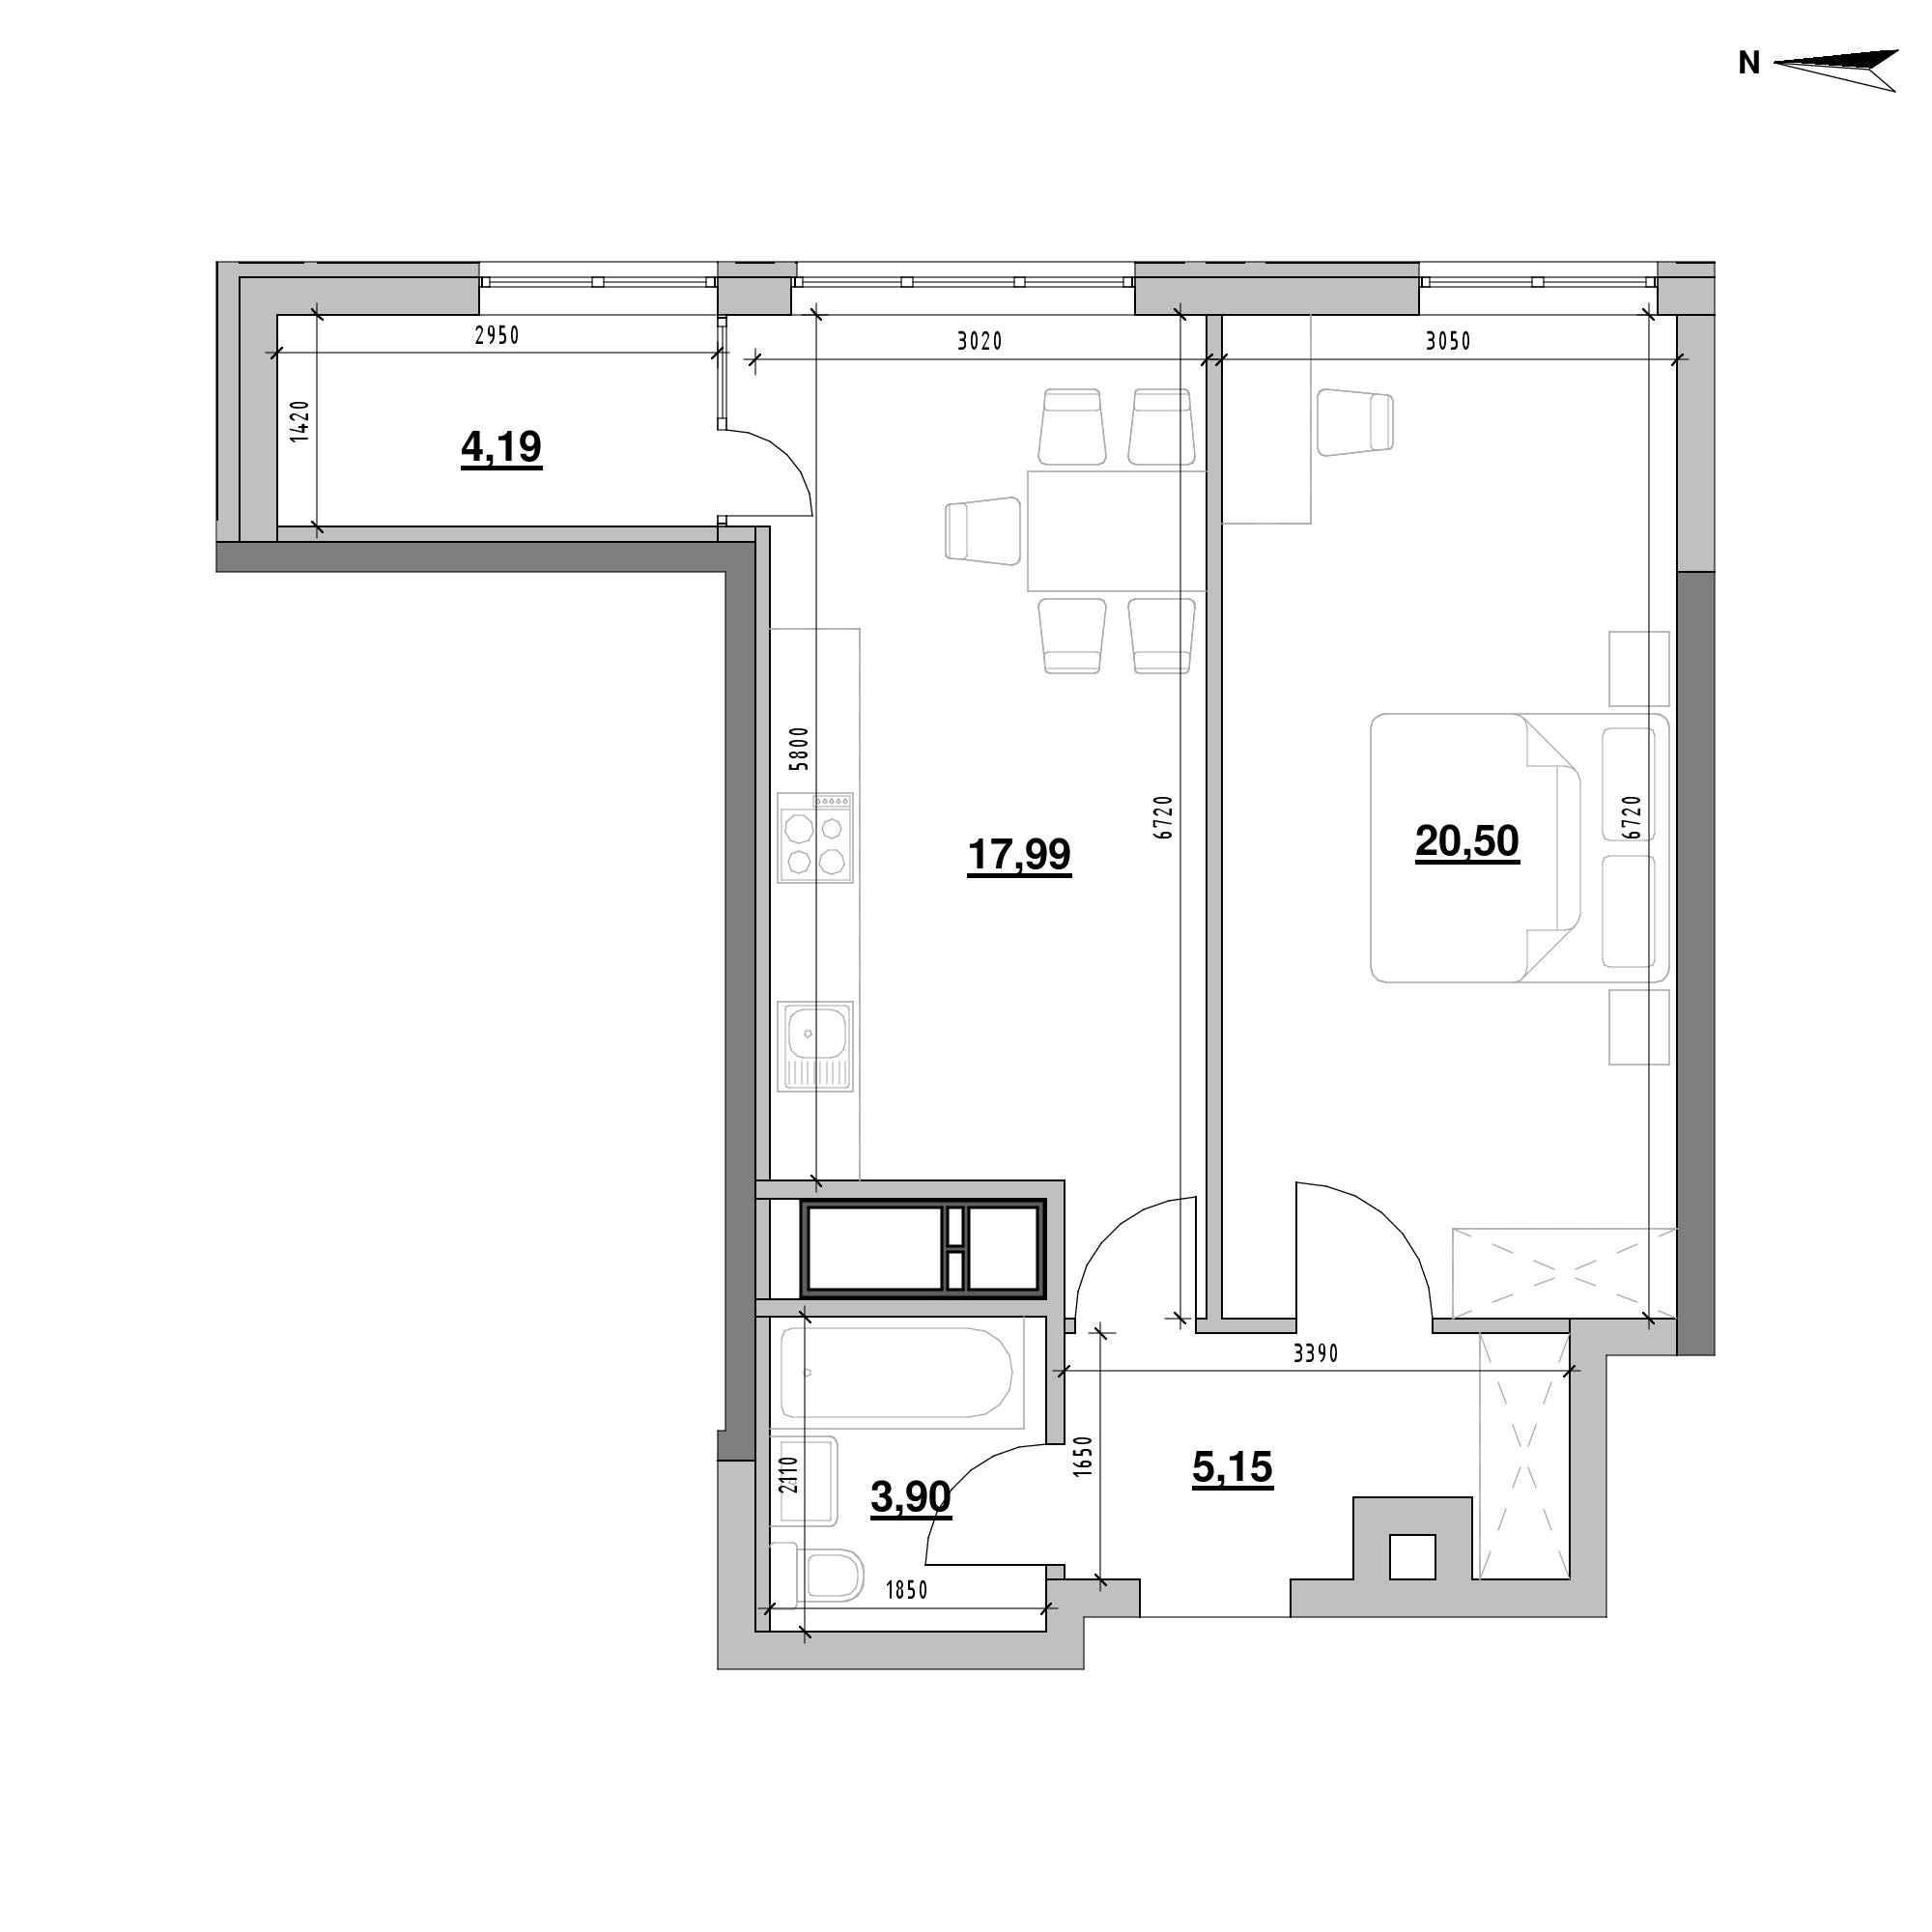 ЖК Nordica Residence: планування 1-кімнатної квартири, №127, 51.73 м<sup>2</sup>